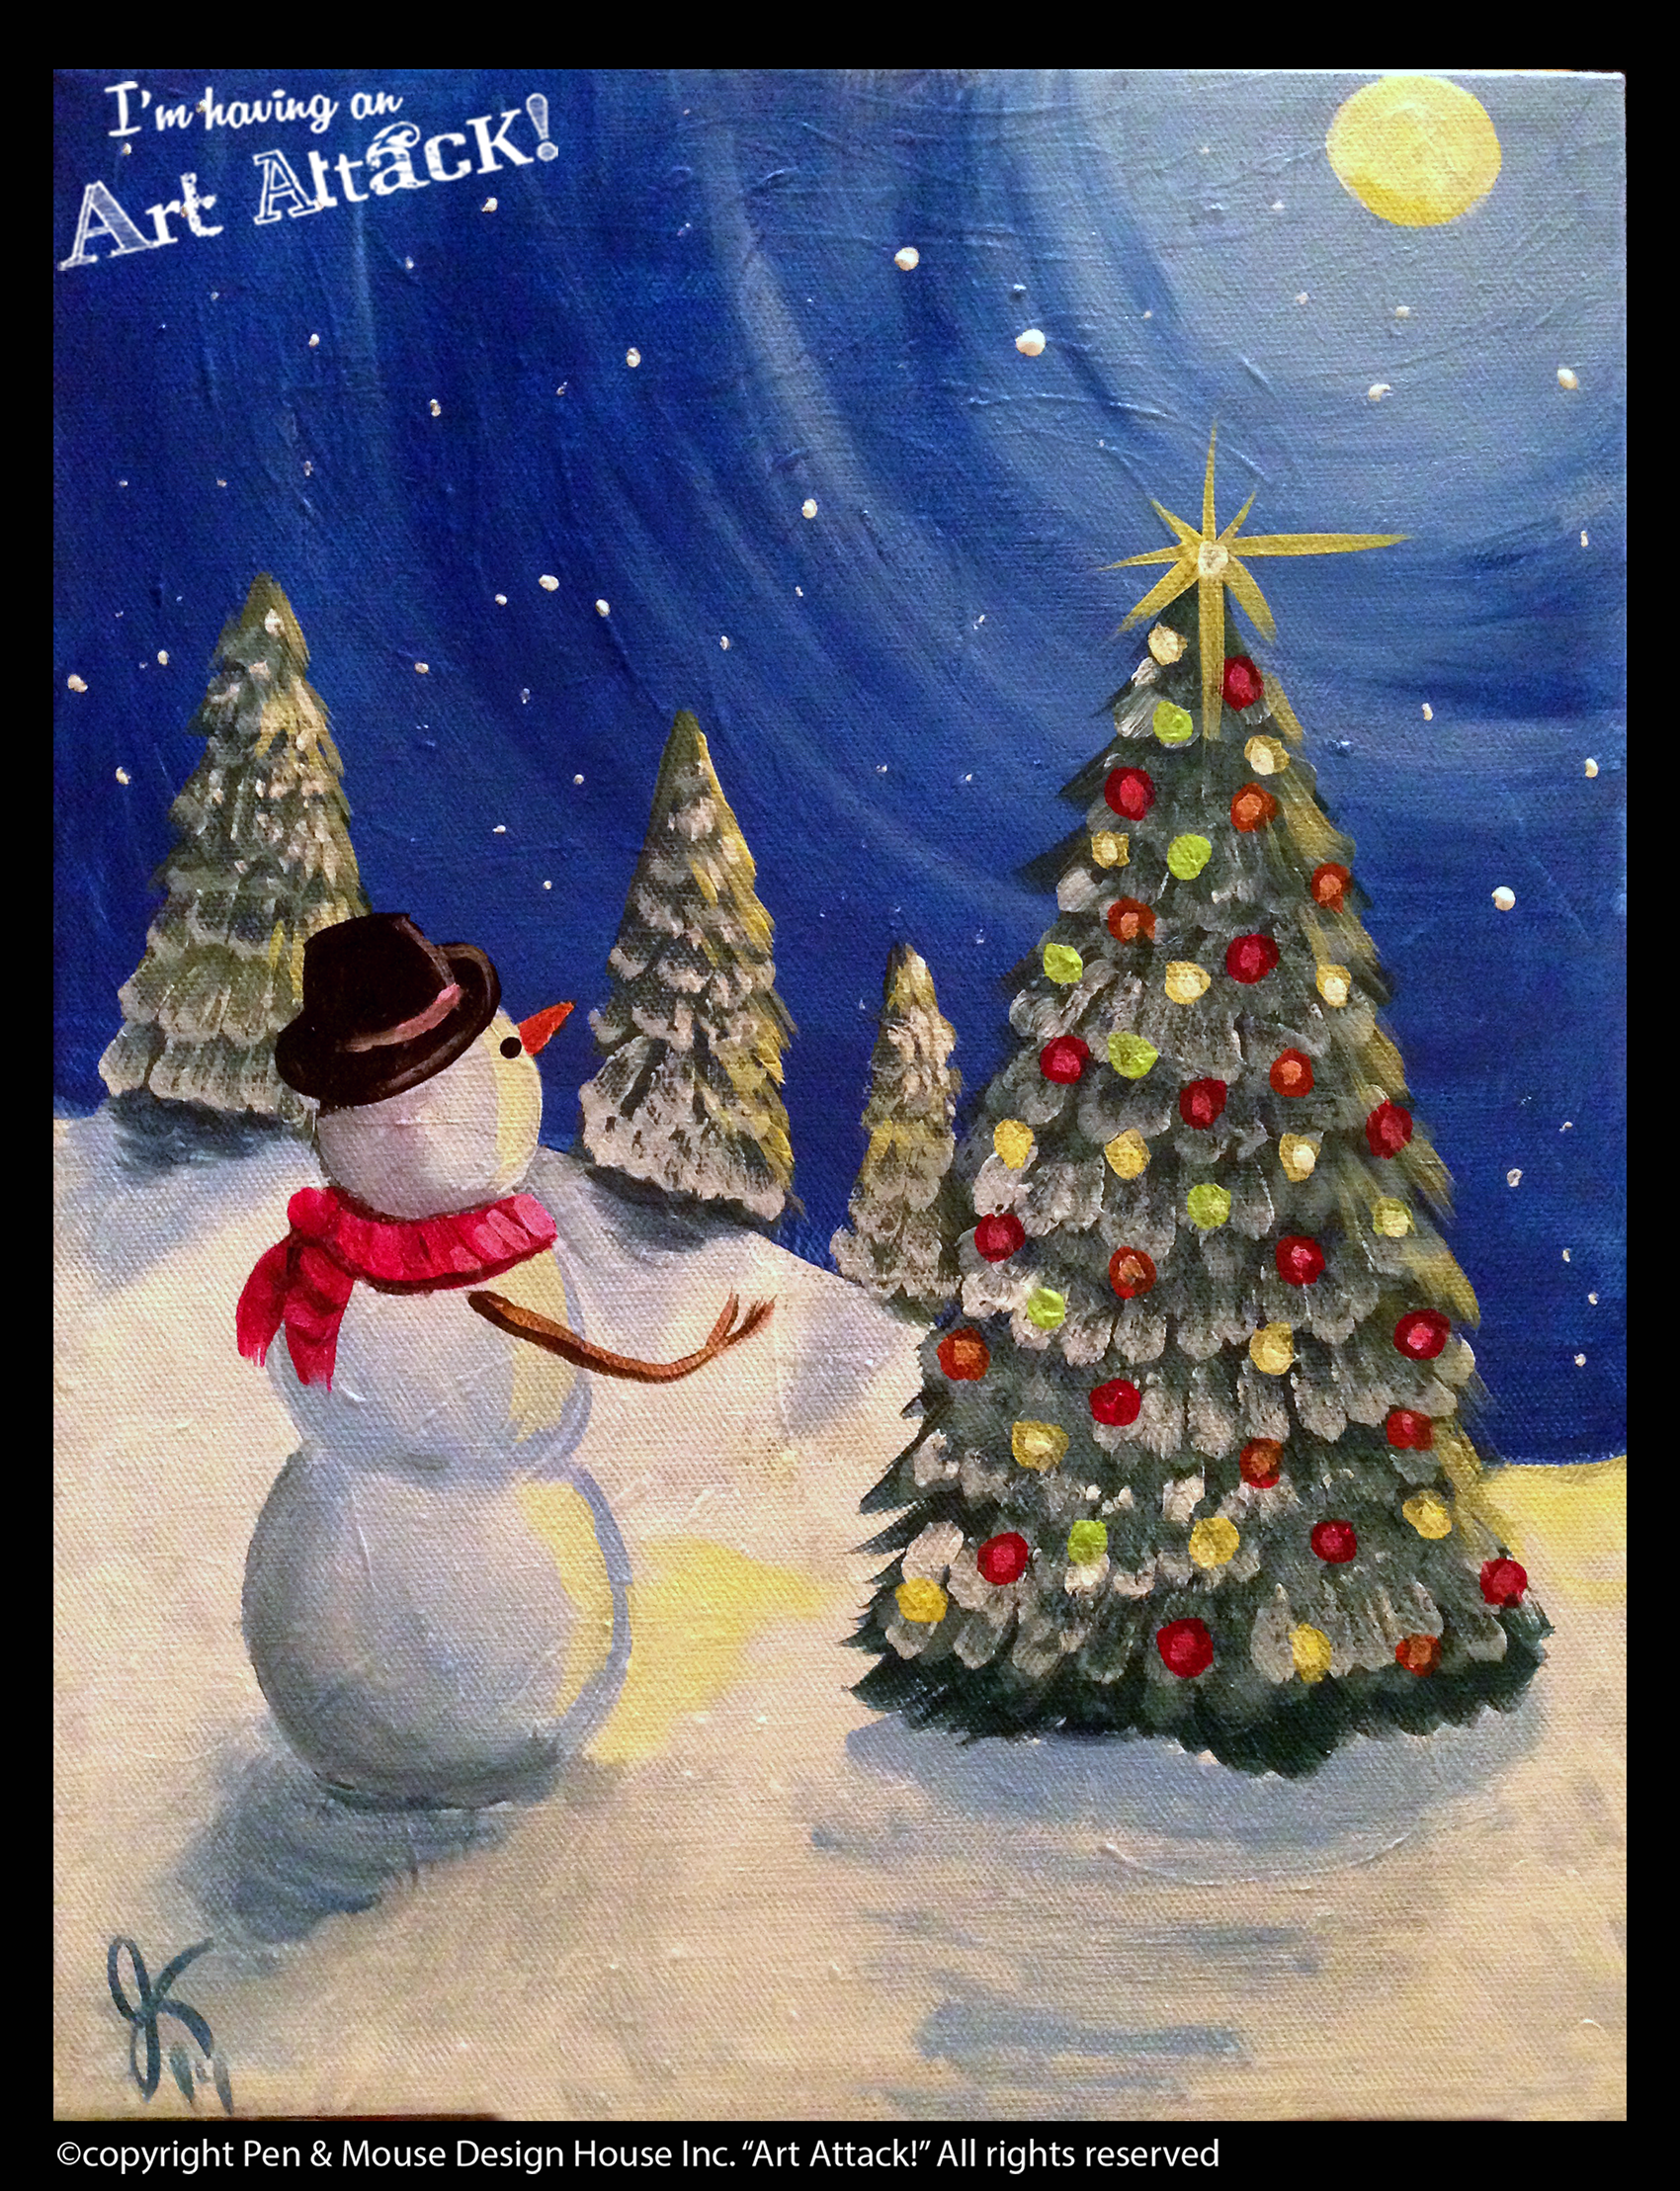 Snowman In Field Canvas Im Having An Art Attack Social Painting Parties Original Artwork By Julie Kukreja Www Artattackpaintparty Com